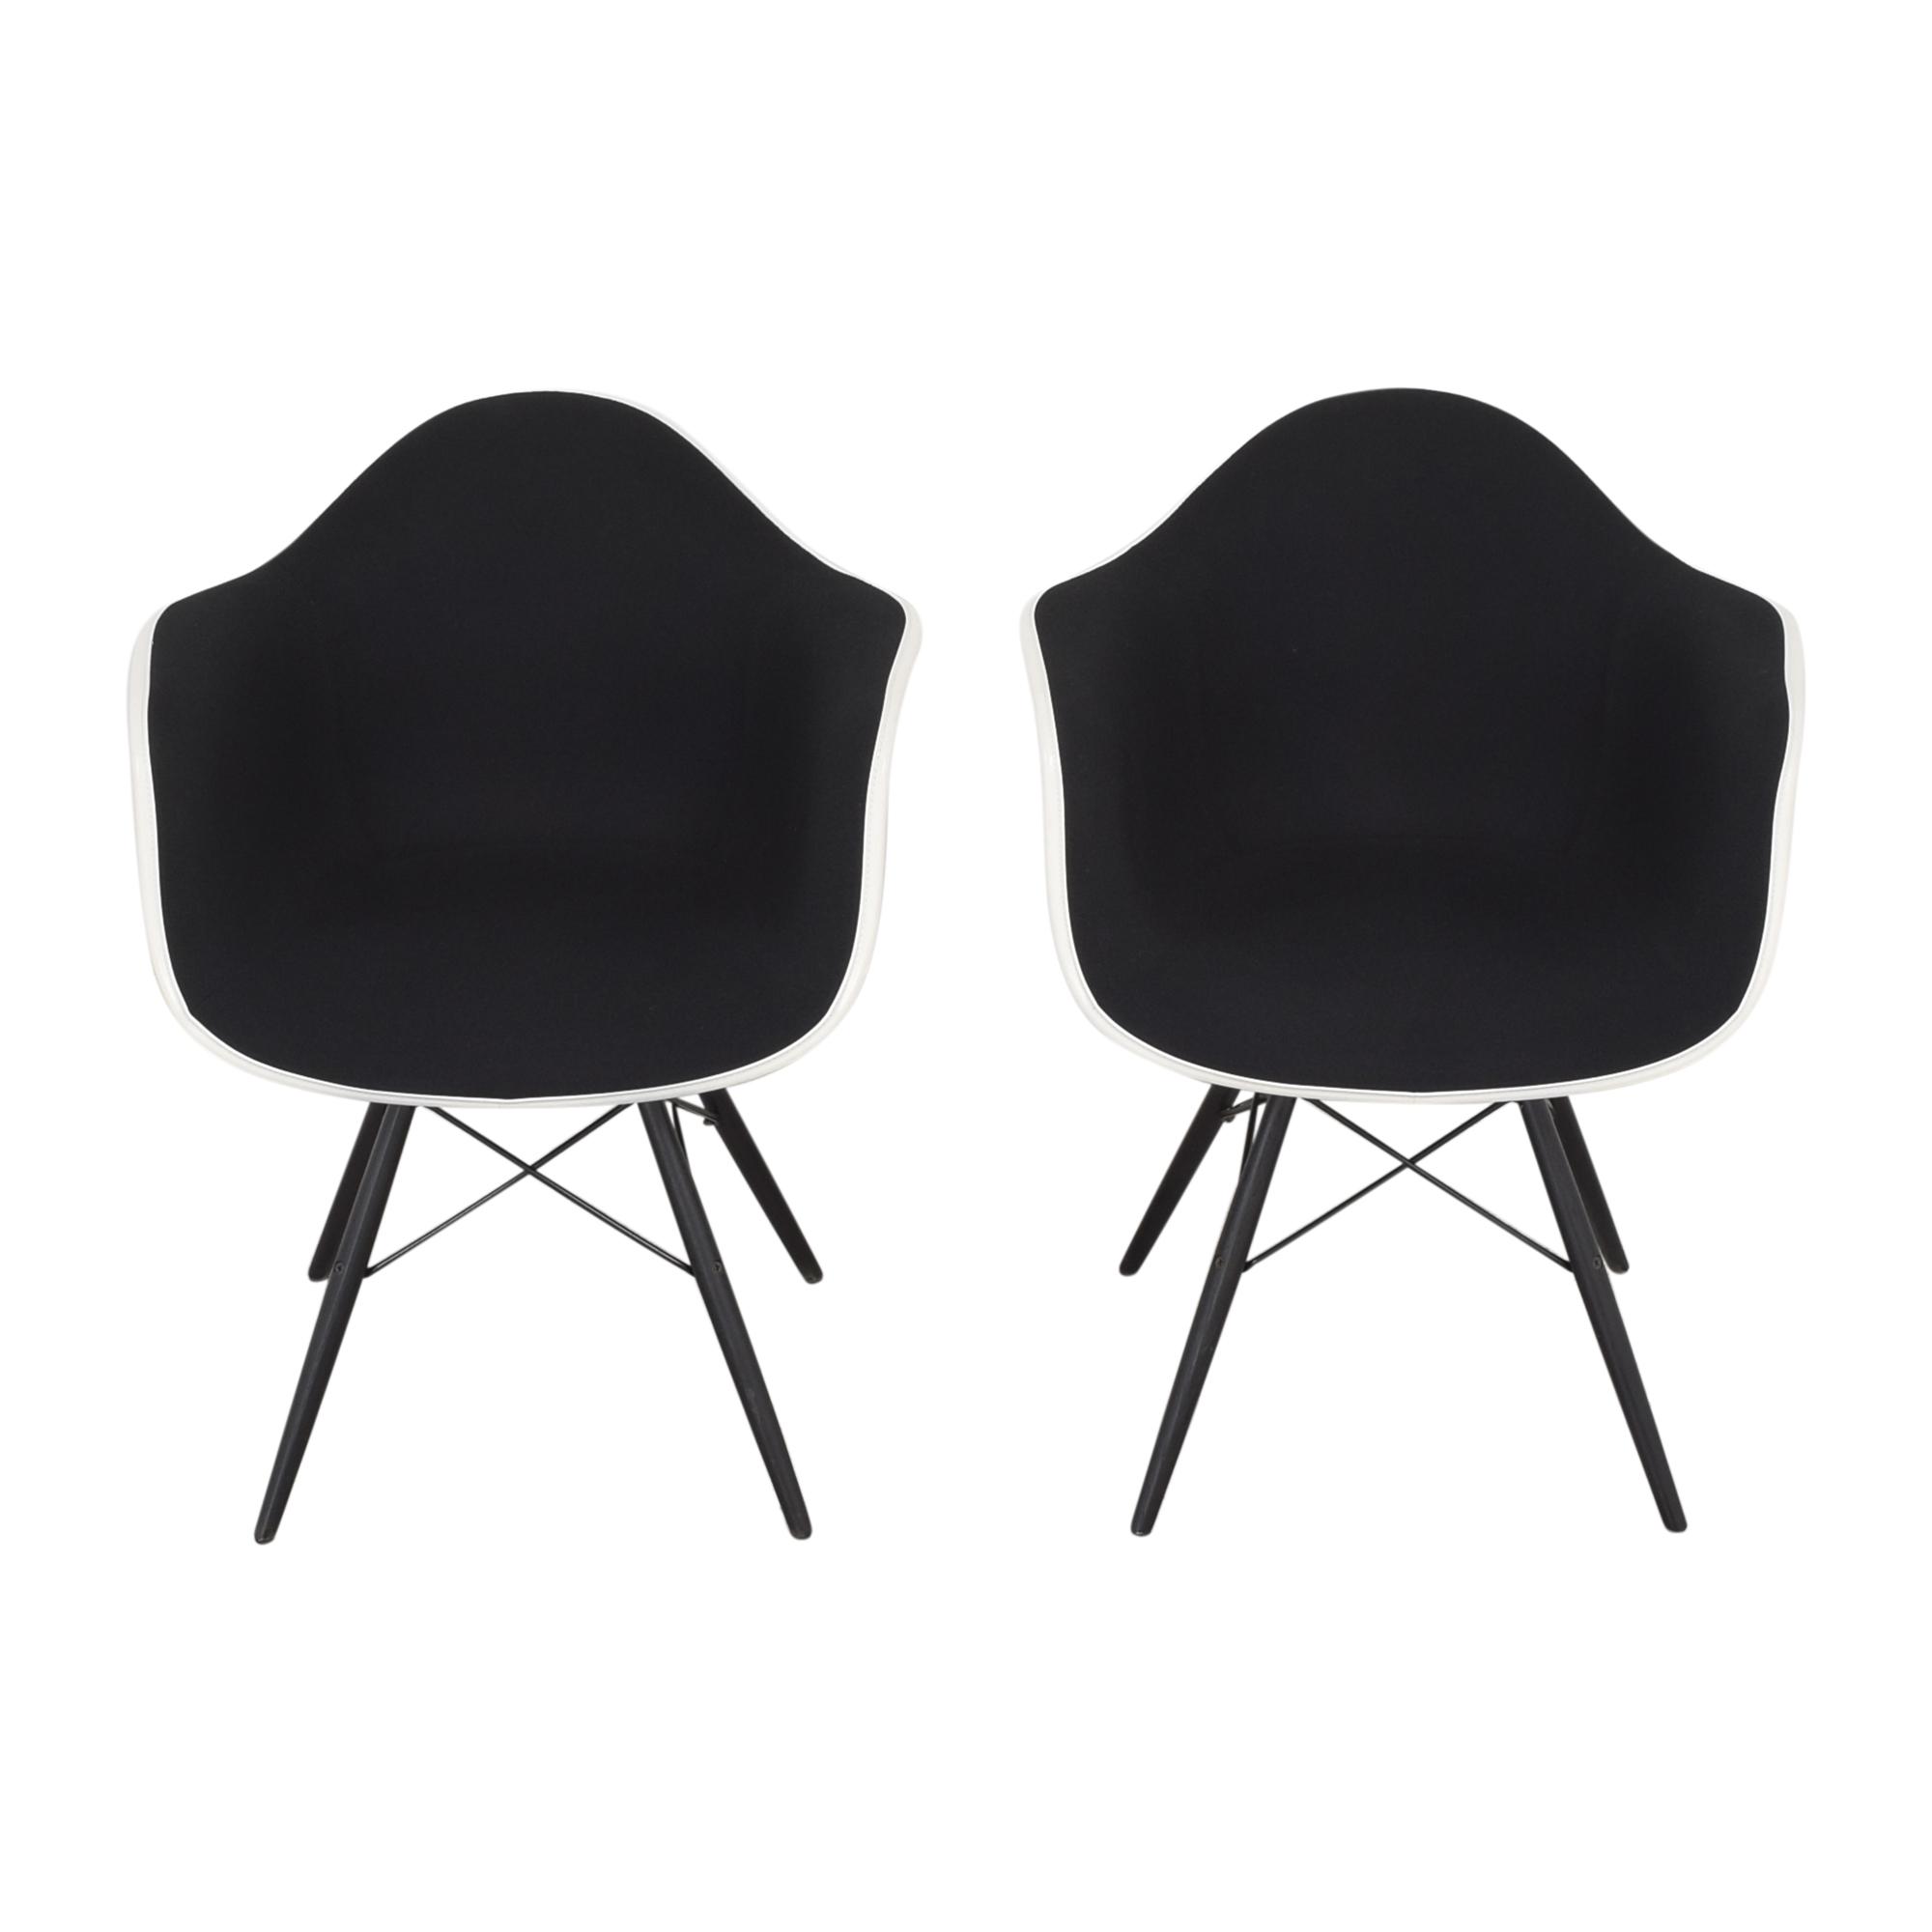 Herman Miller Herman Miller Eames Molded Arm Chairs price